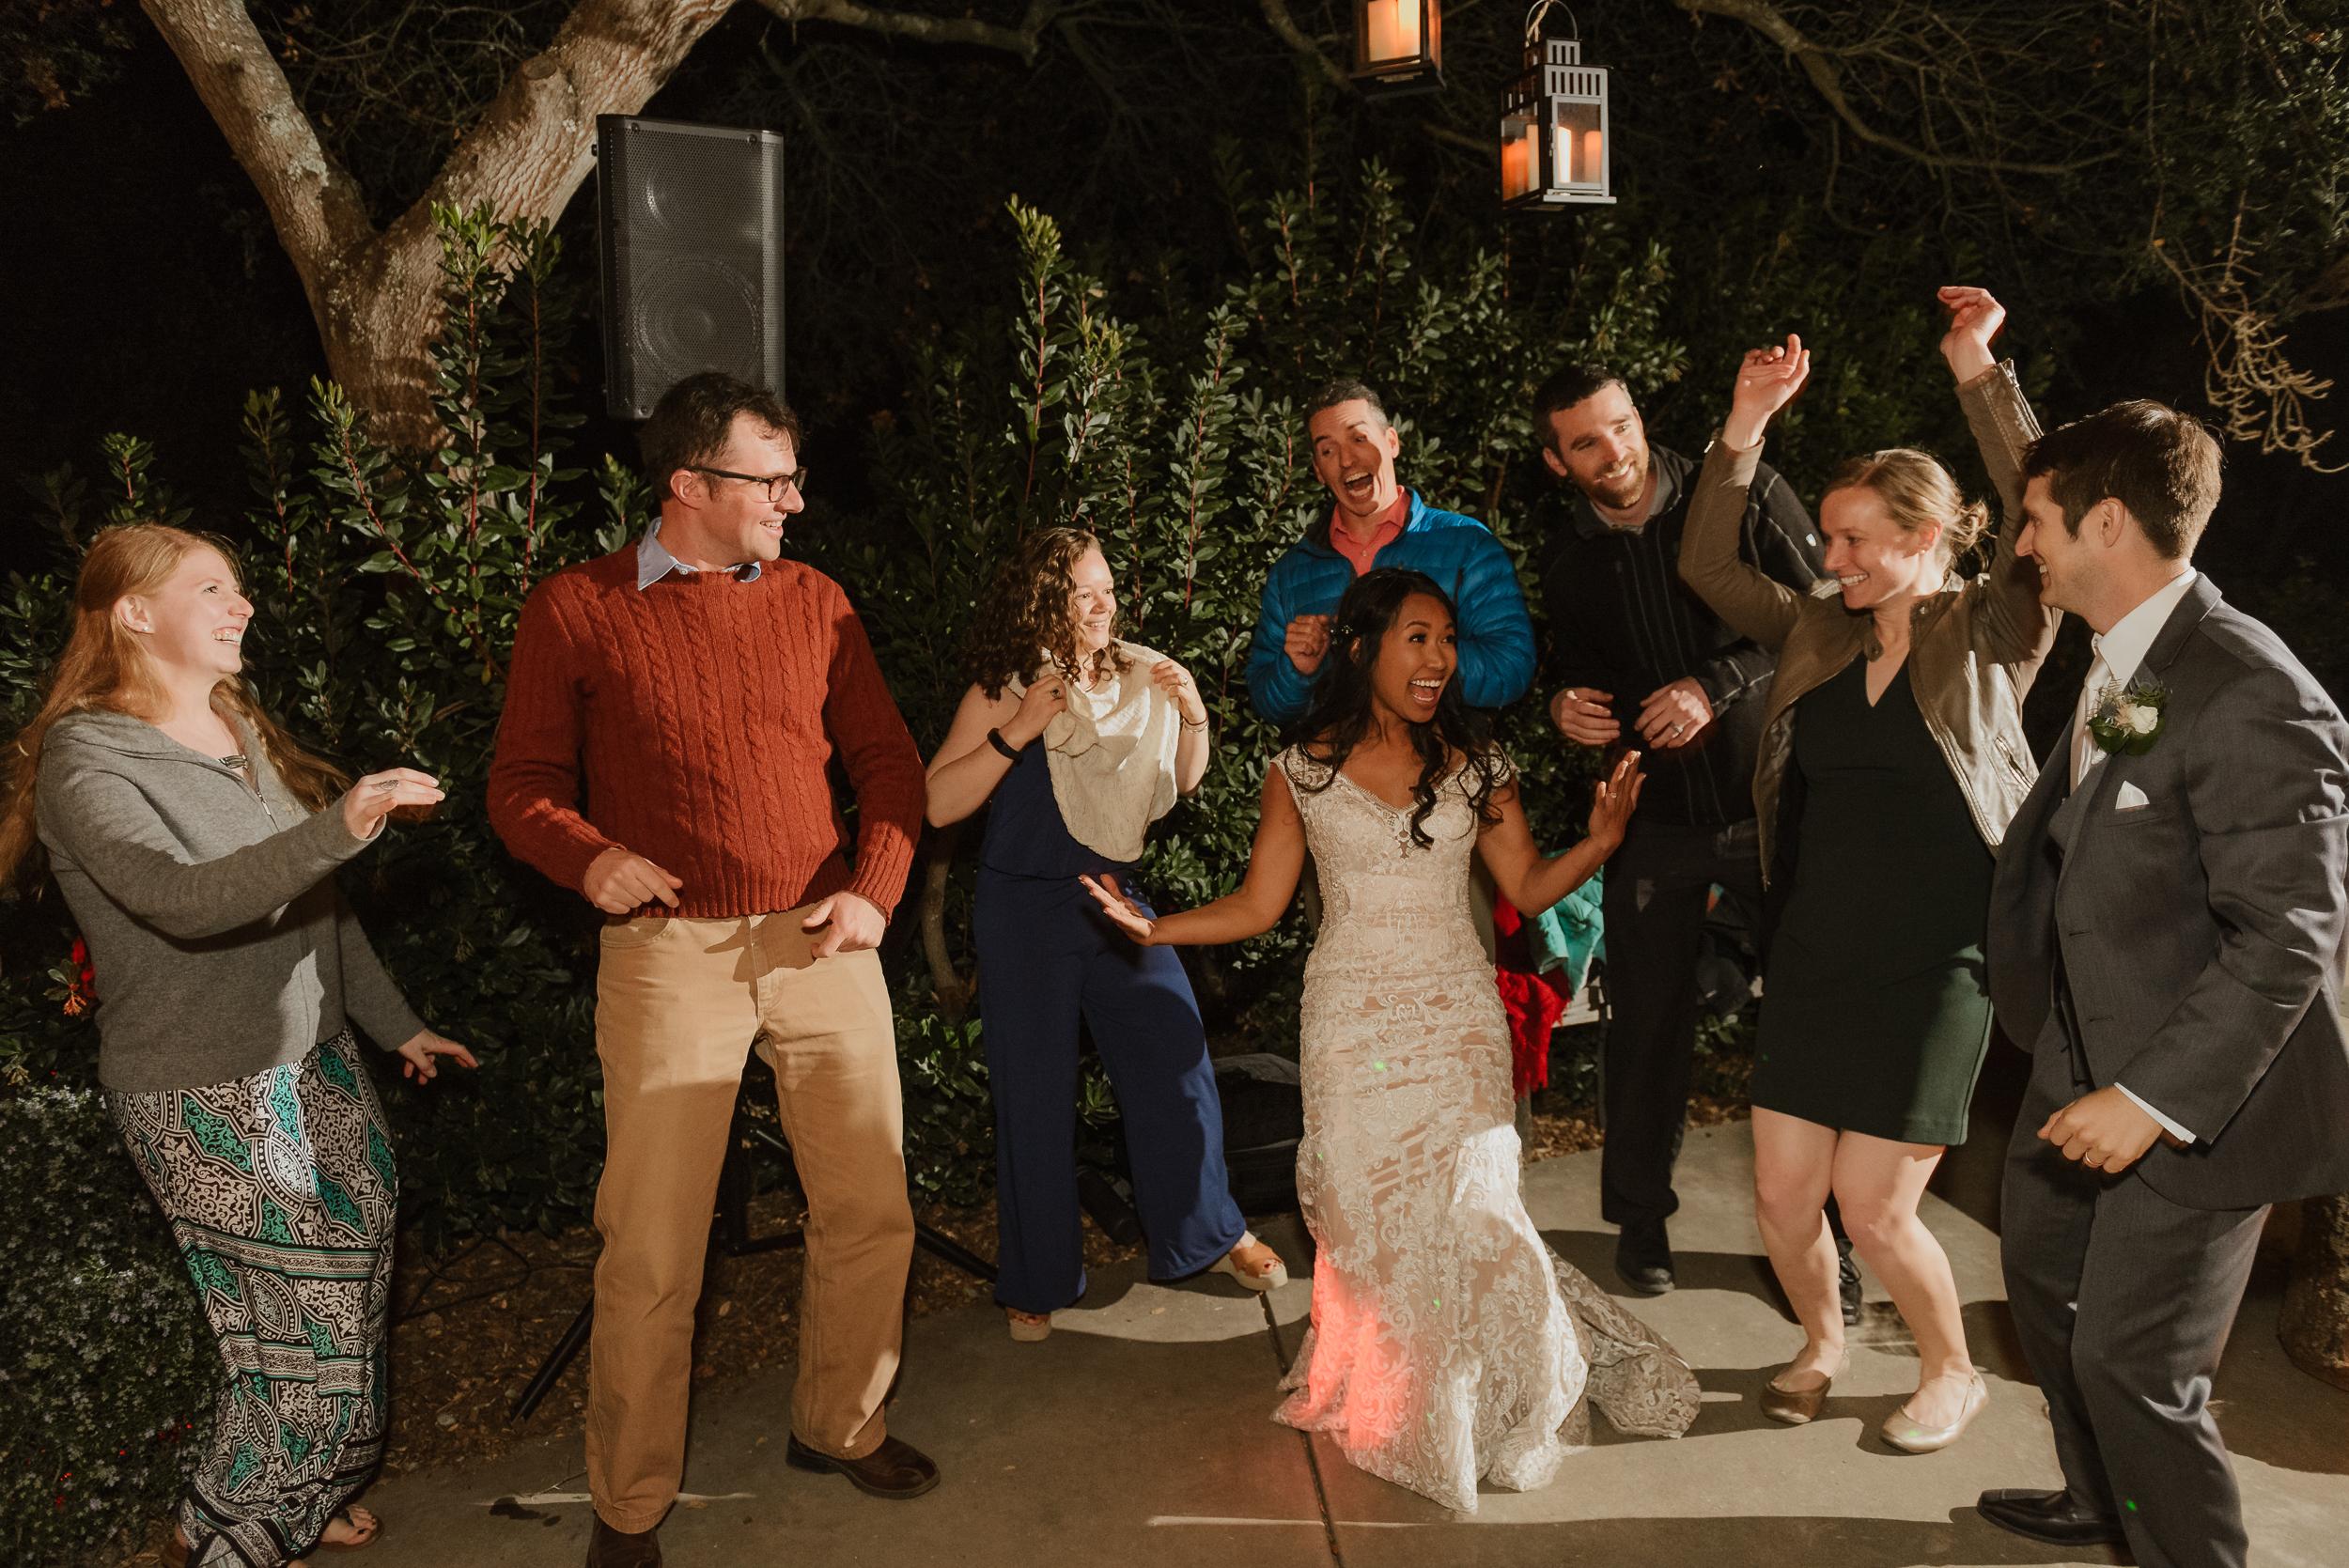 114marin-petaluma-backyard-wedding-vivianchen-703.jpg